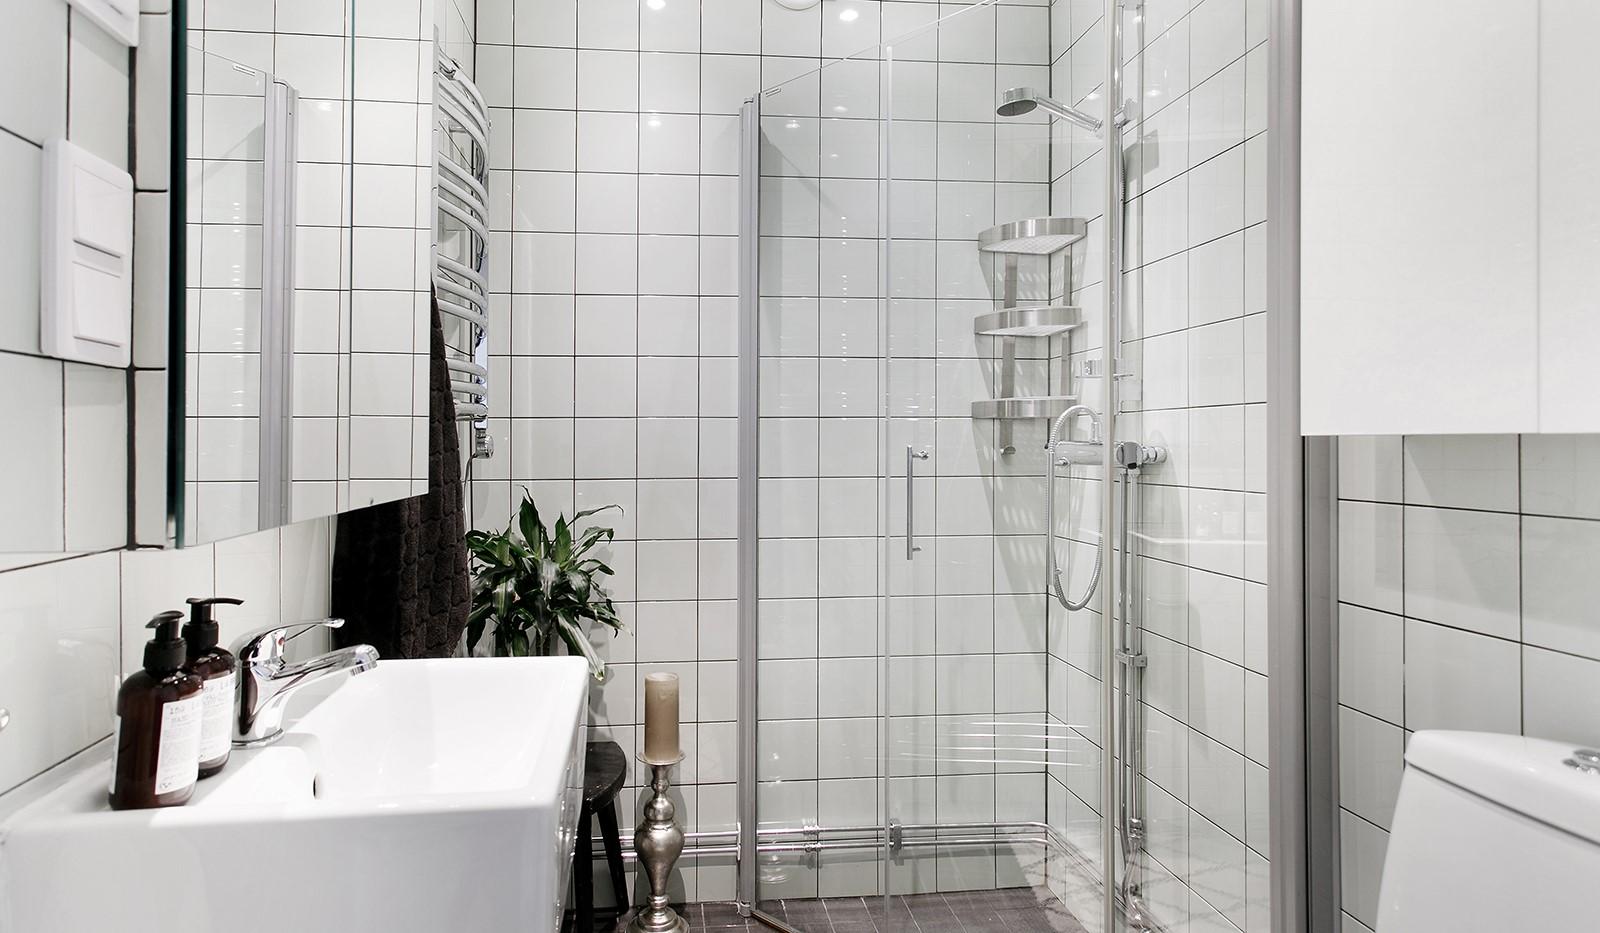 Maria Prästgårdsgata 39, 1tr - Stilrent renoverat badrum